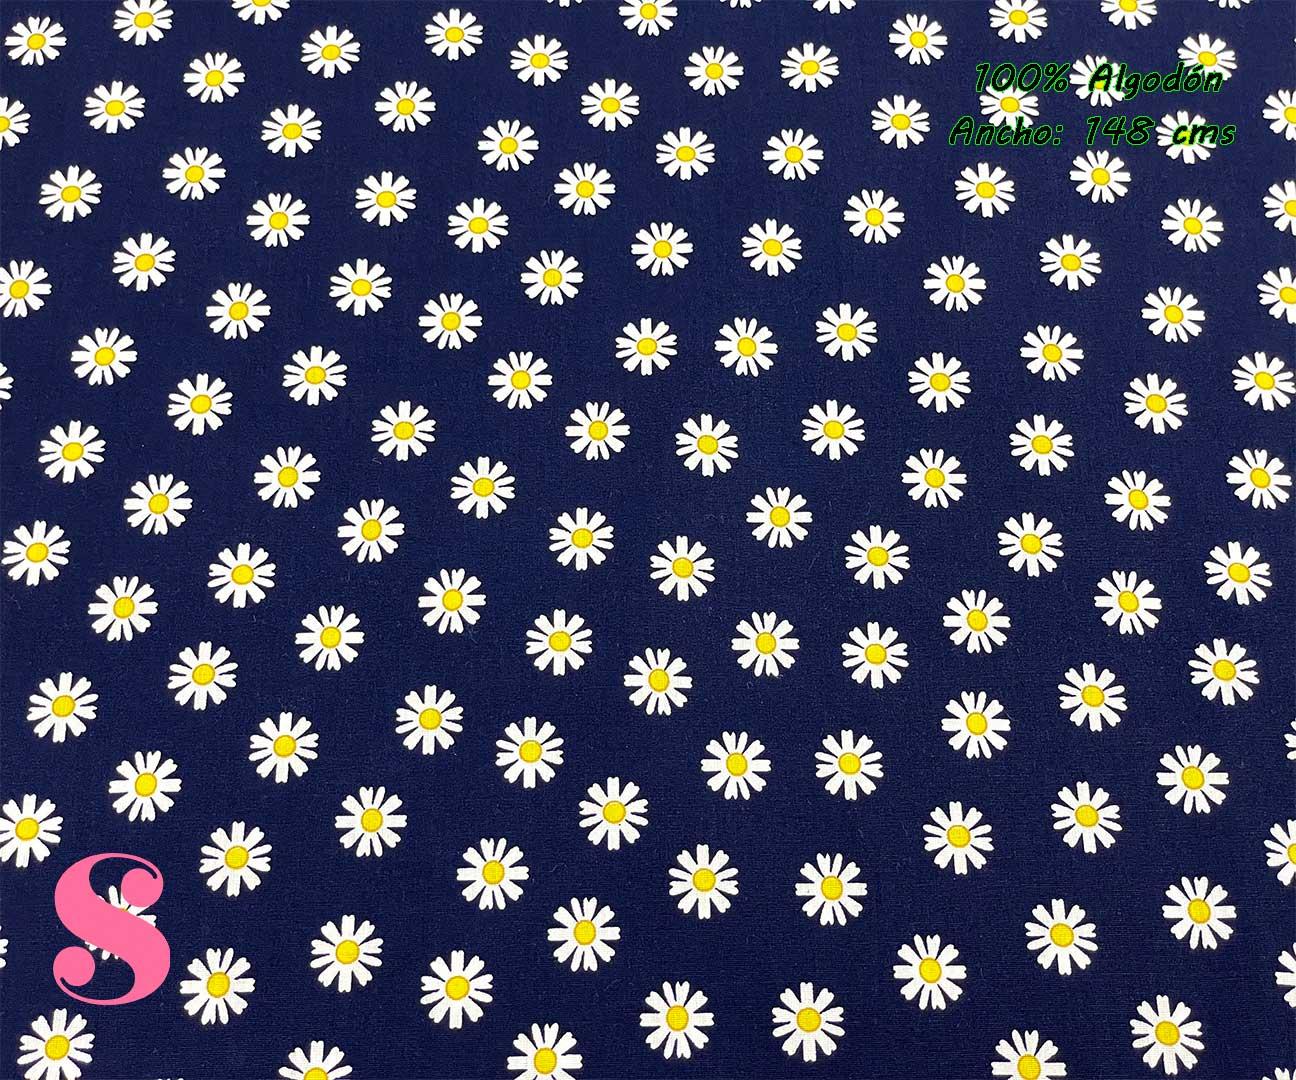 71-tela-estampada-flores,telas-dibujos-primaverales,telas-infantiles,tejidos-infantiles,Tejido Estampado Margaritas fondo Marino